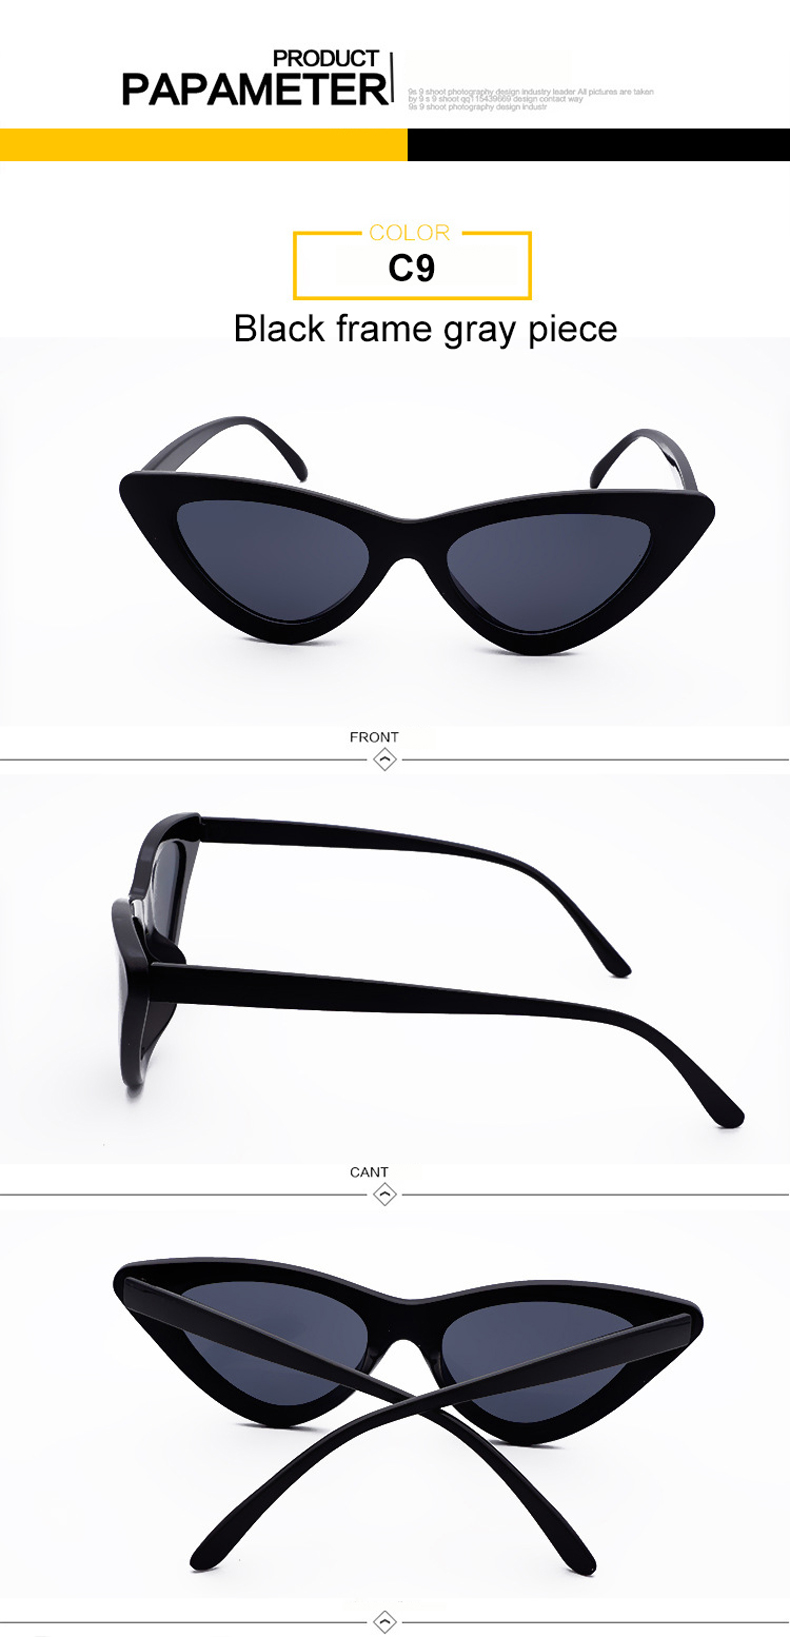 HTB1bb1VjqmgSKJjSspiq6xyJFXan - WHO CUTIE 2018 Brand Designer Black Cat Eye Sunglasses Women Cool Small Cateye Frame Sun Glasses Fashion UV400 Shades WG-008